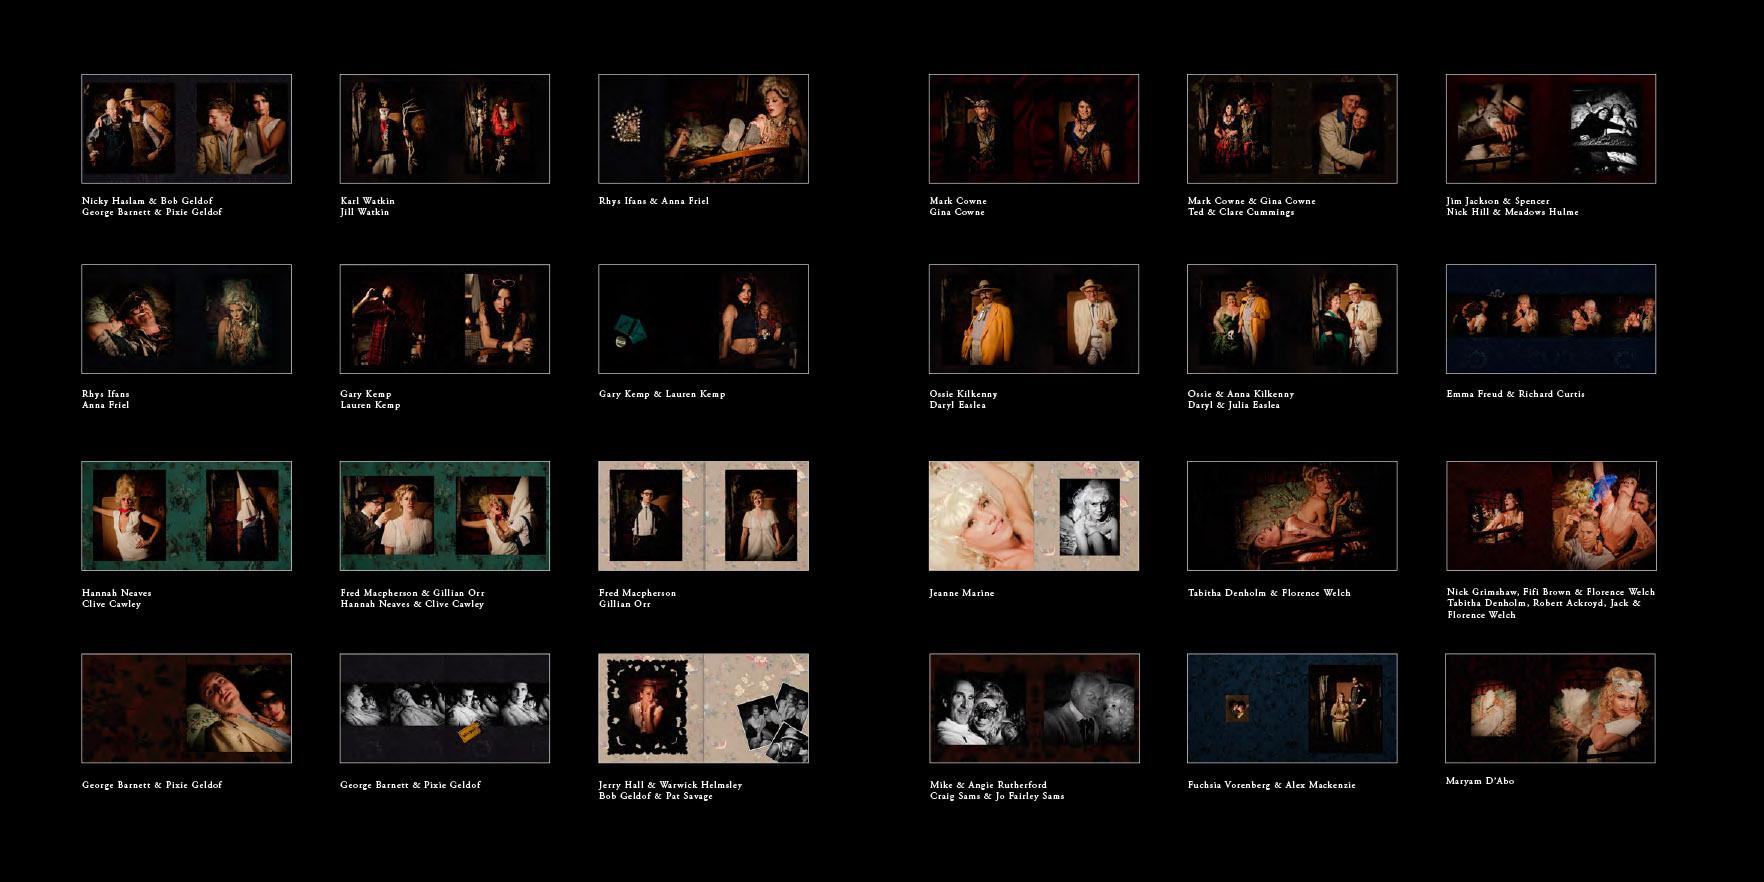 BobnPixieCutDown-39 copy.jpg